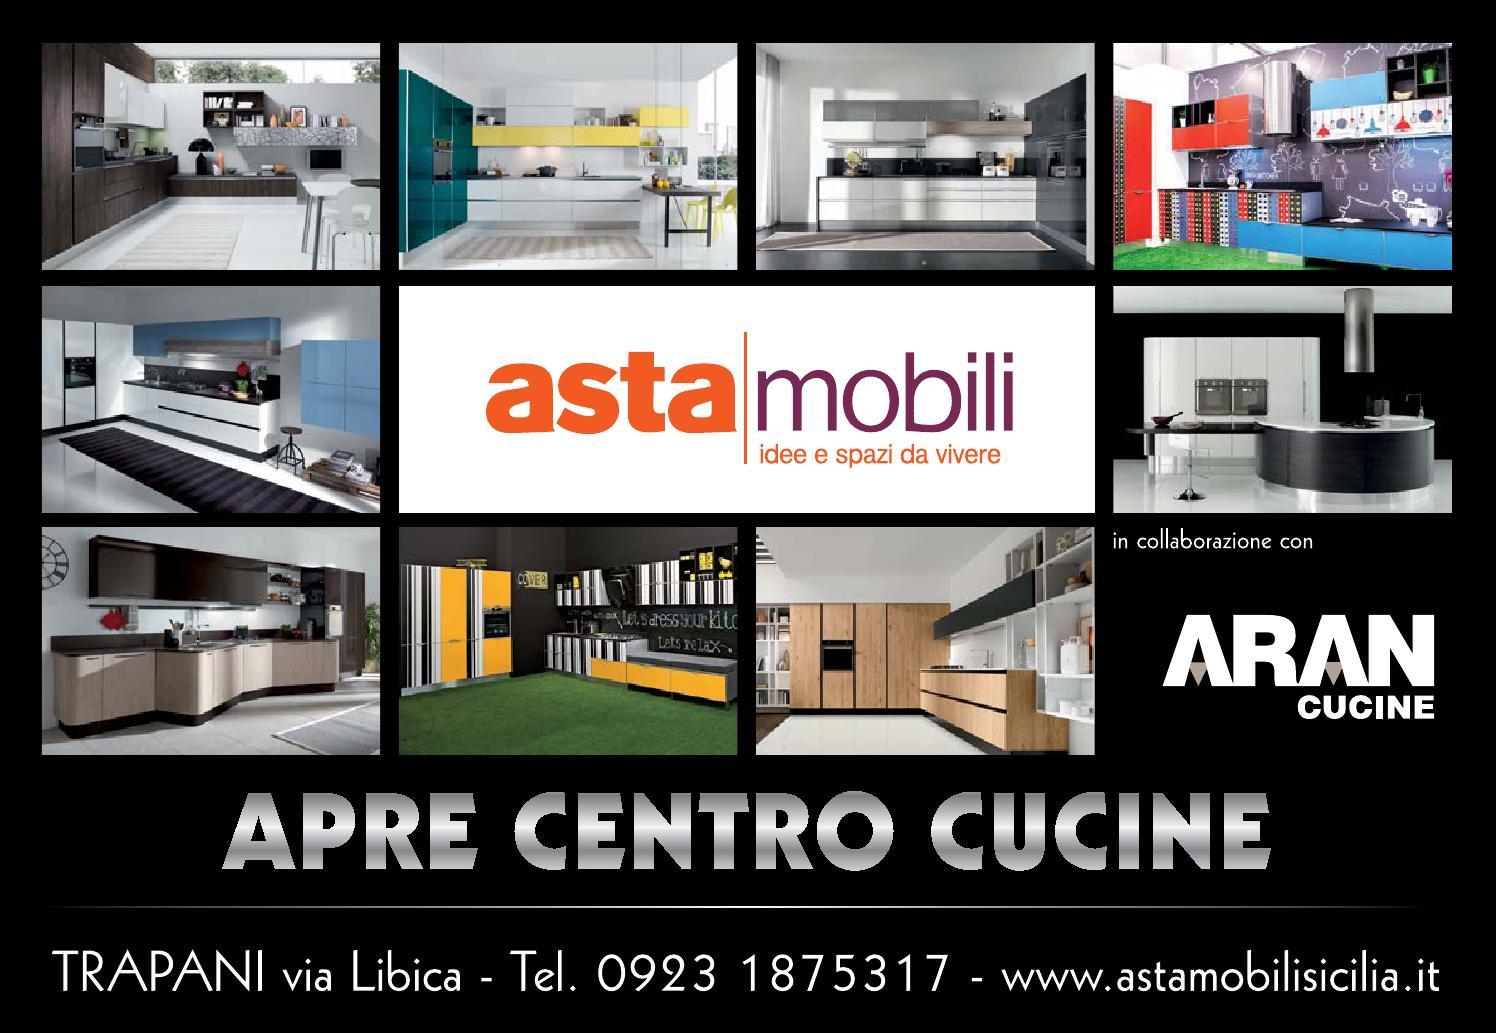 Best Asta Mobili Trapani Images - harrop.us - harrop.us